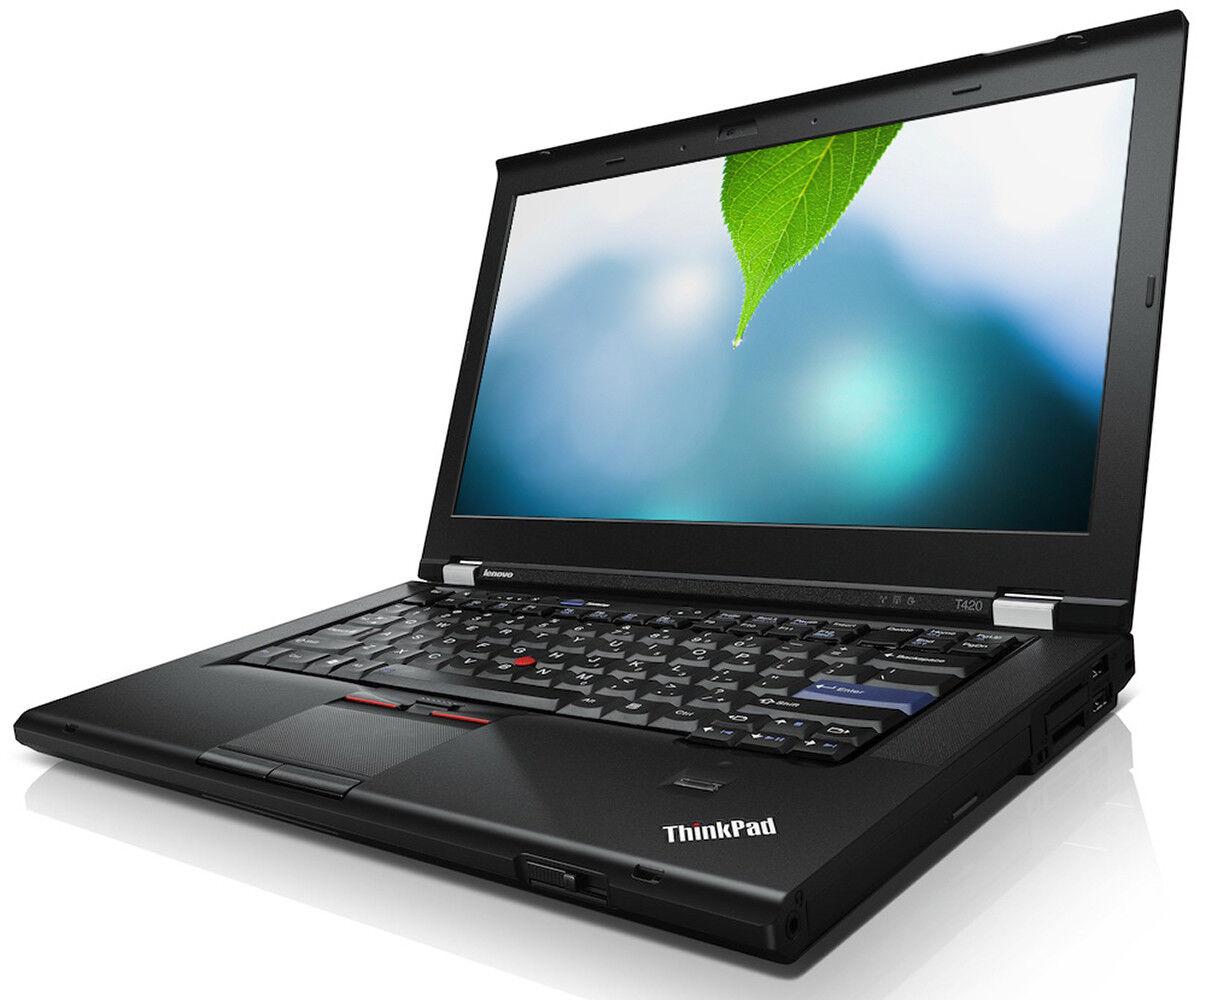 Fast Lenovo T420 Core i5 8GB 320GB Windows 10 Pro Thinkpad Laptop WiFi  WebCam